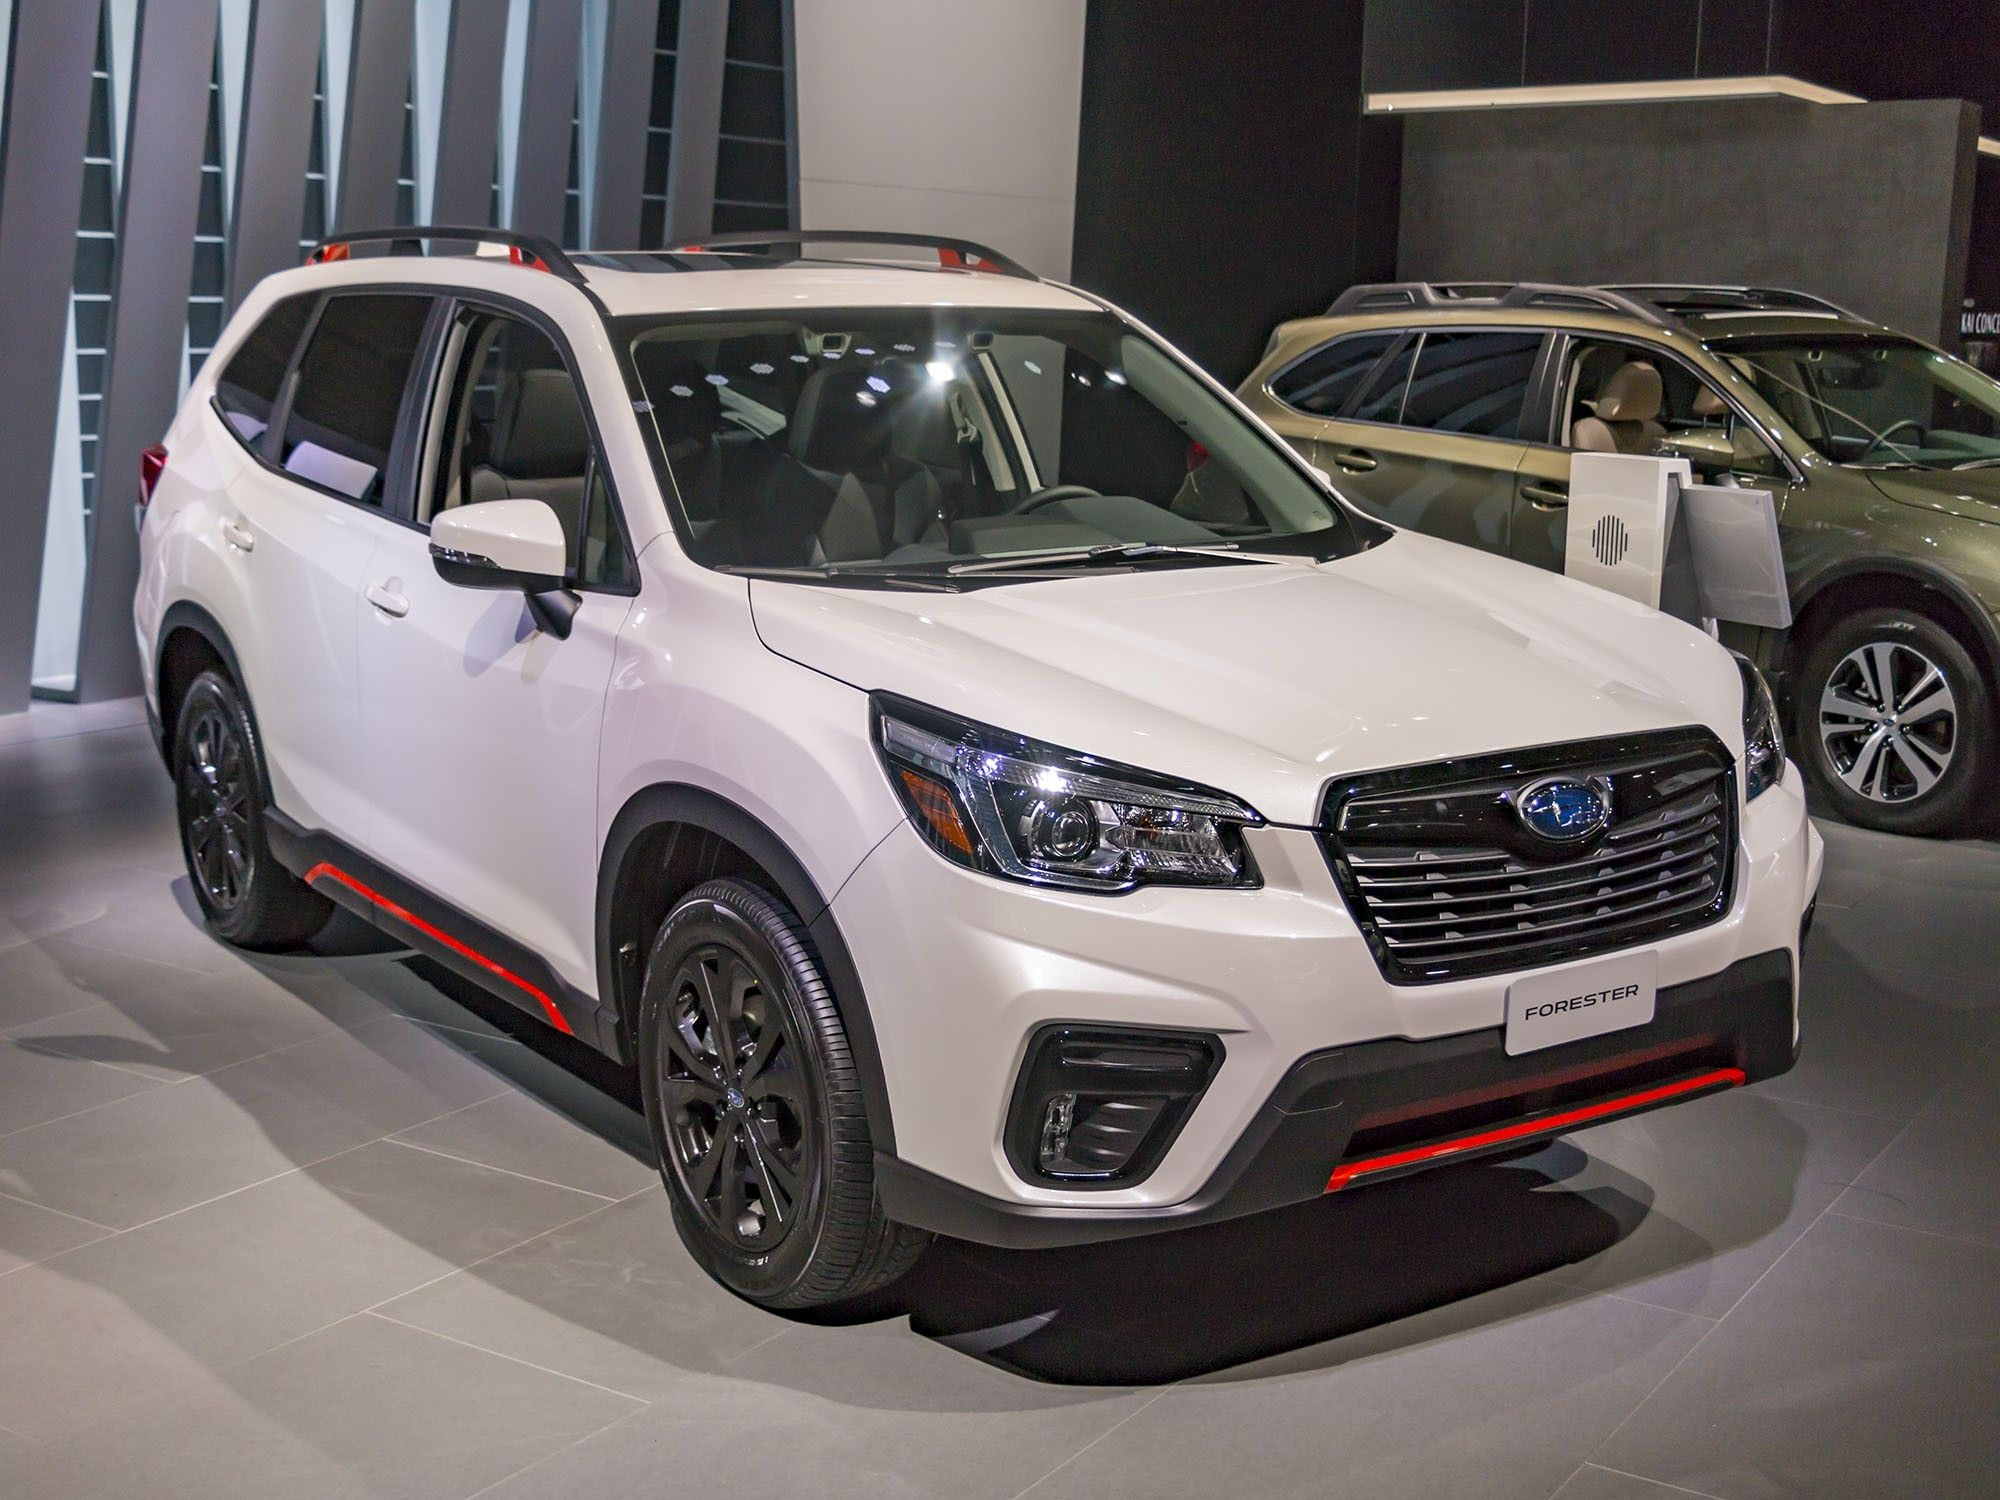 2019 Subaru Model Picture Subaru cars, Subaru forester